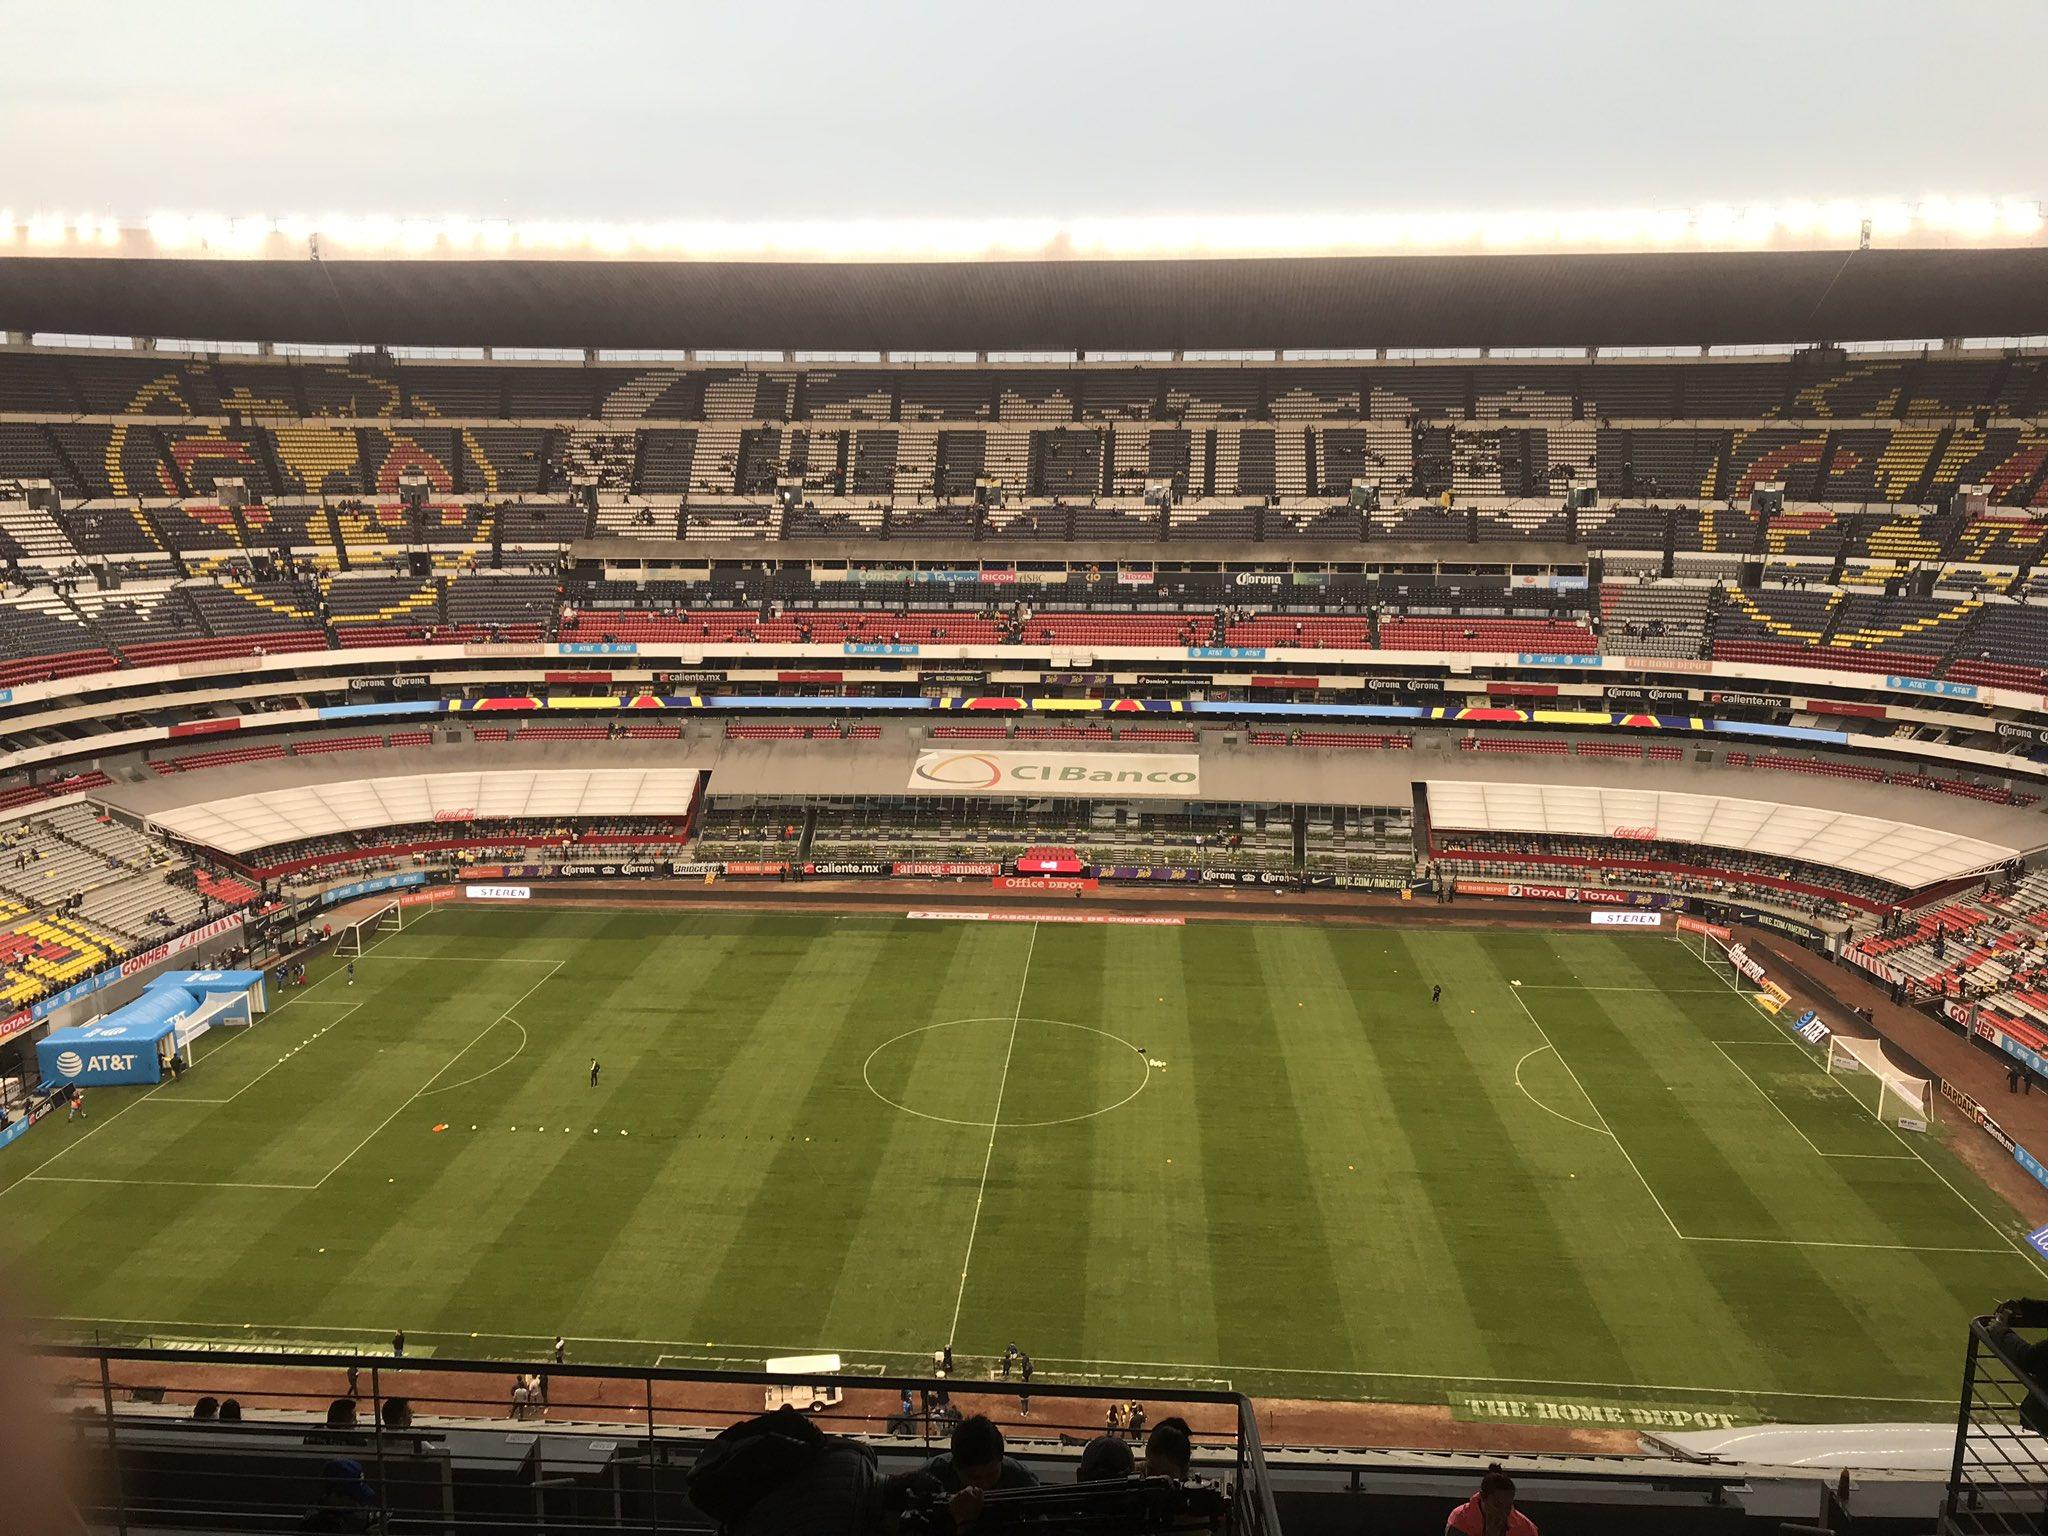 América Golea 3-0 al Pachuca en la J3 2019